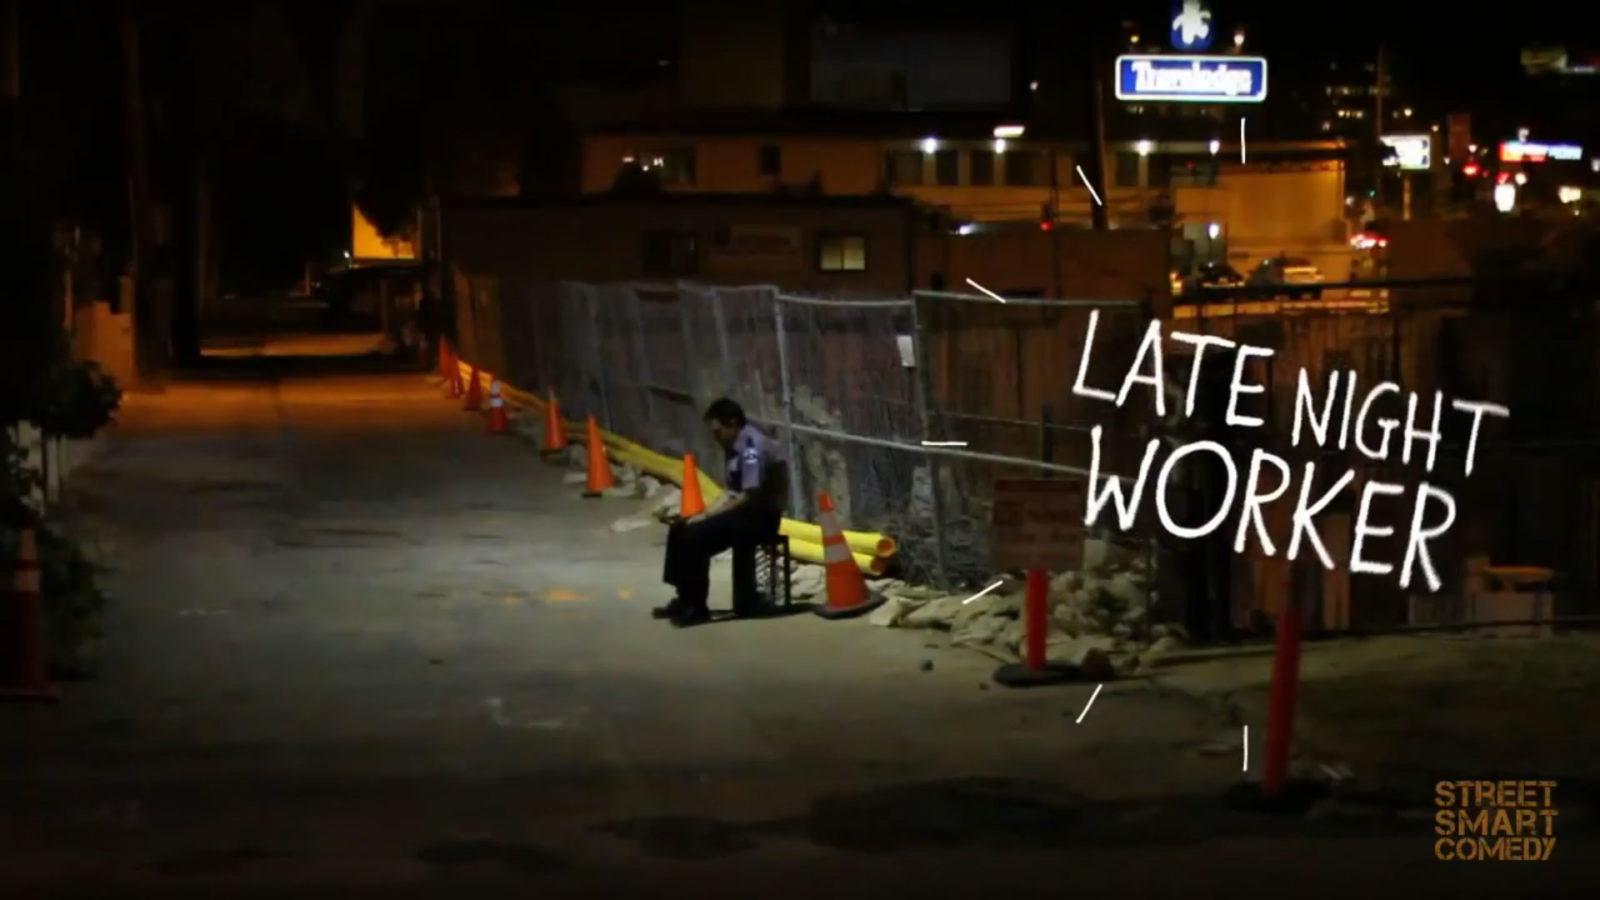 Late Night Worker